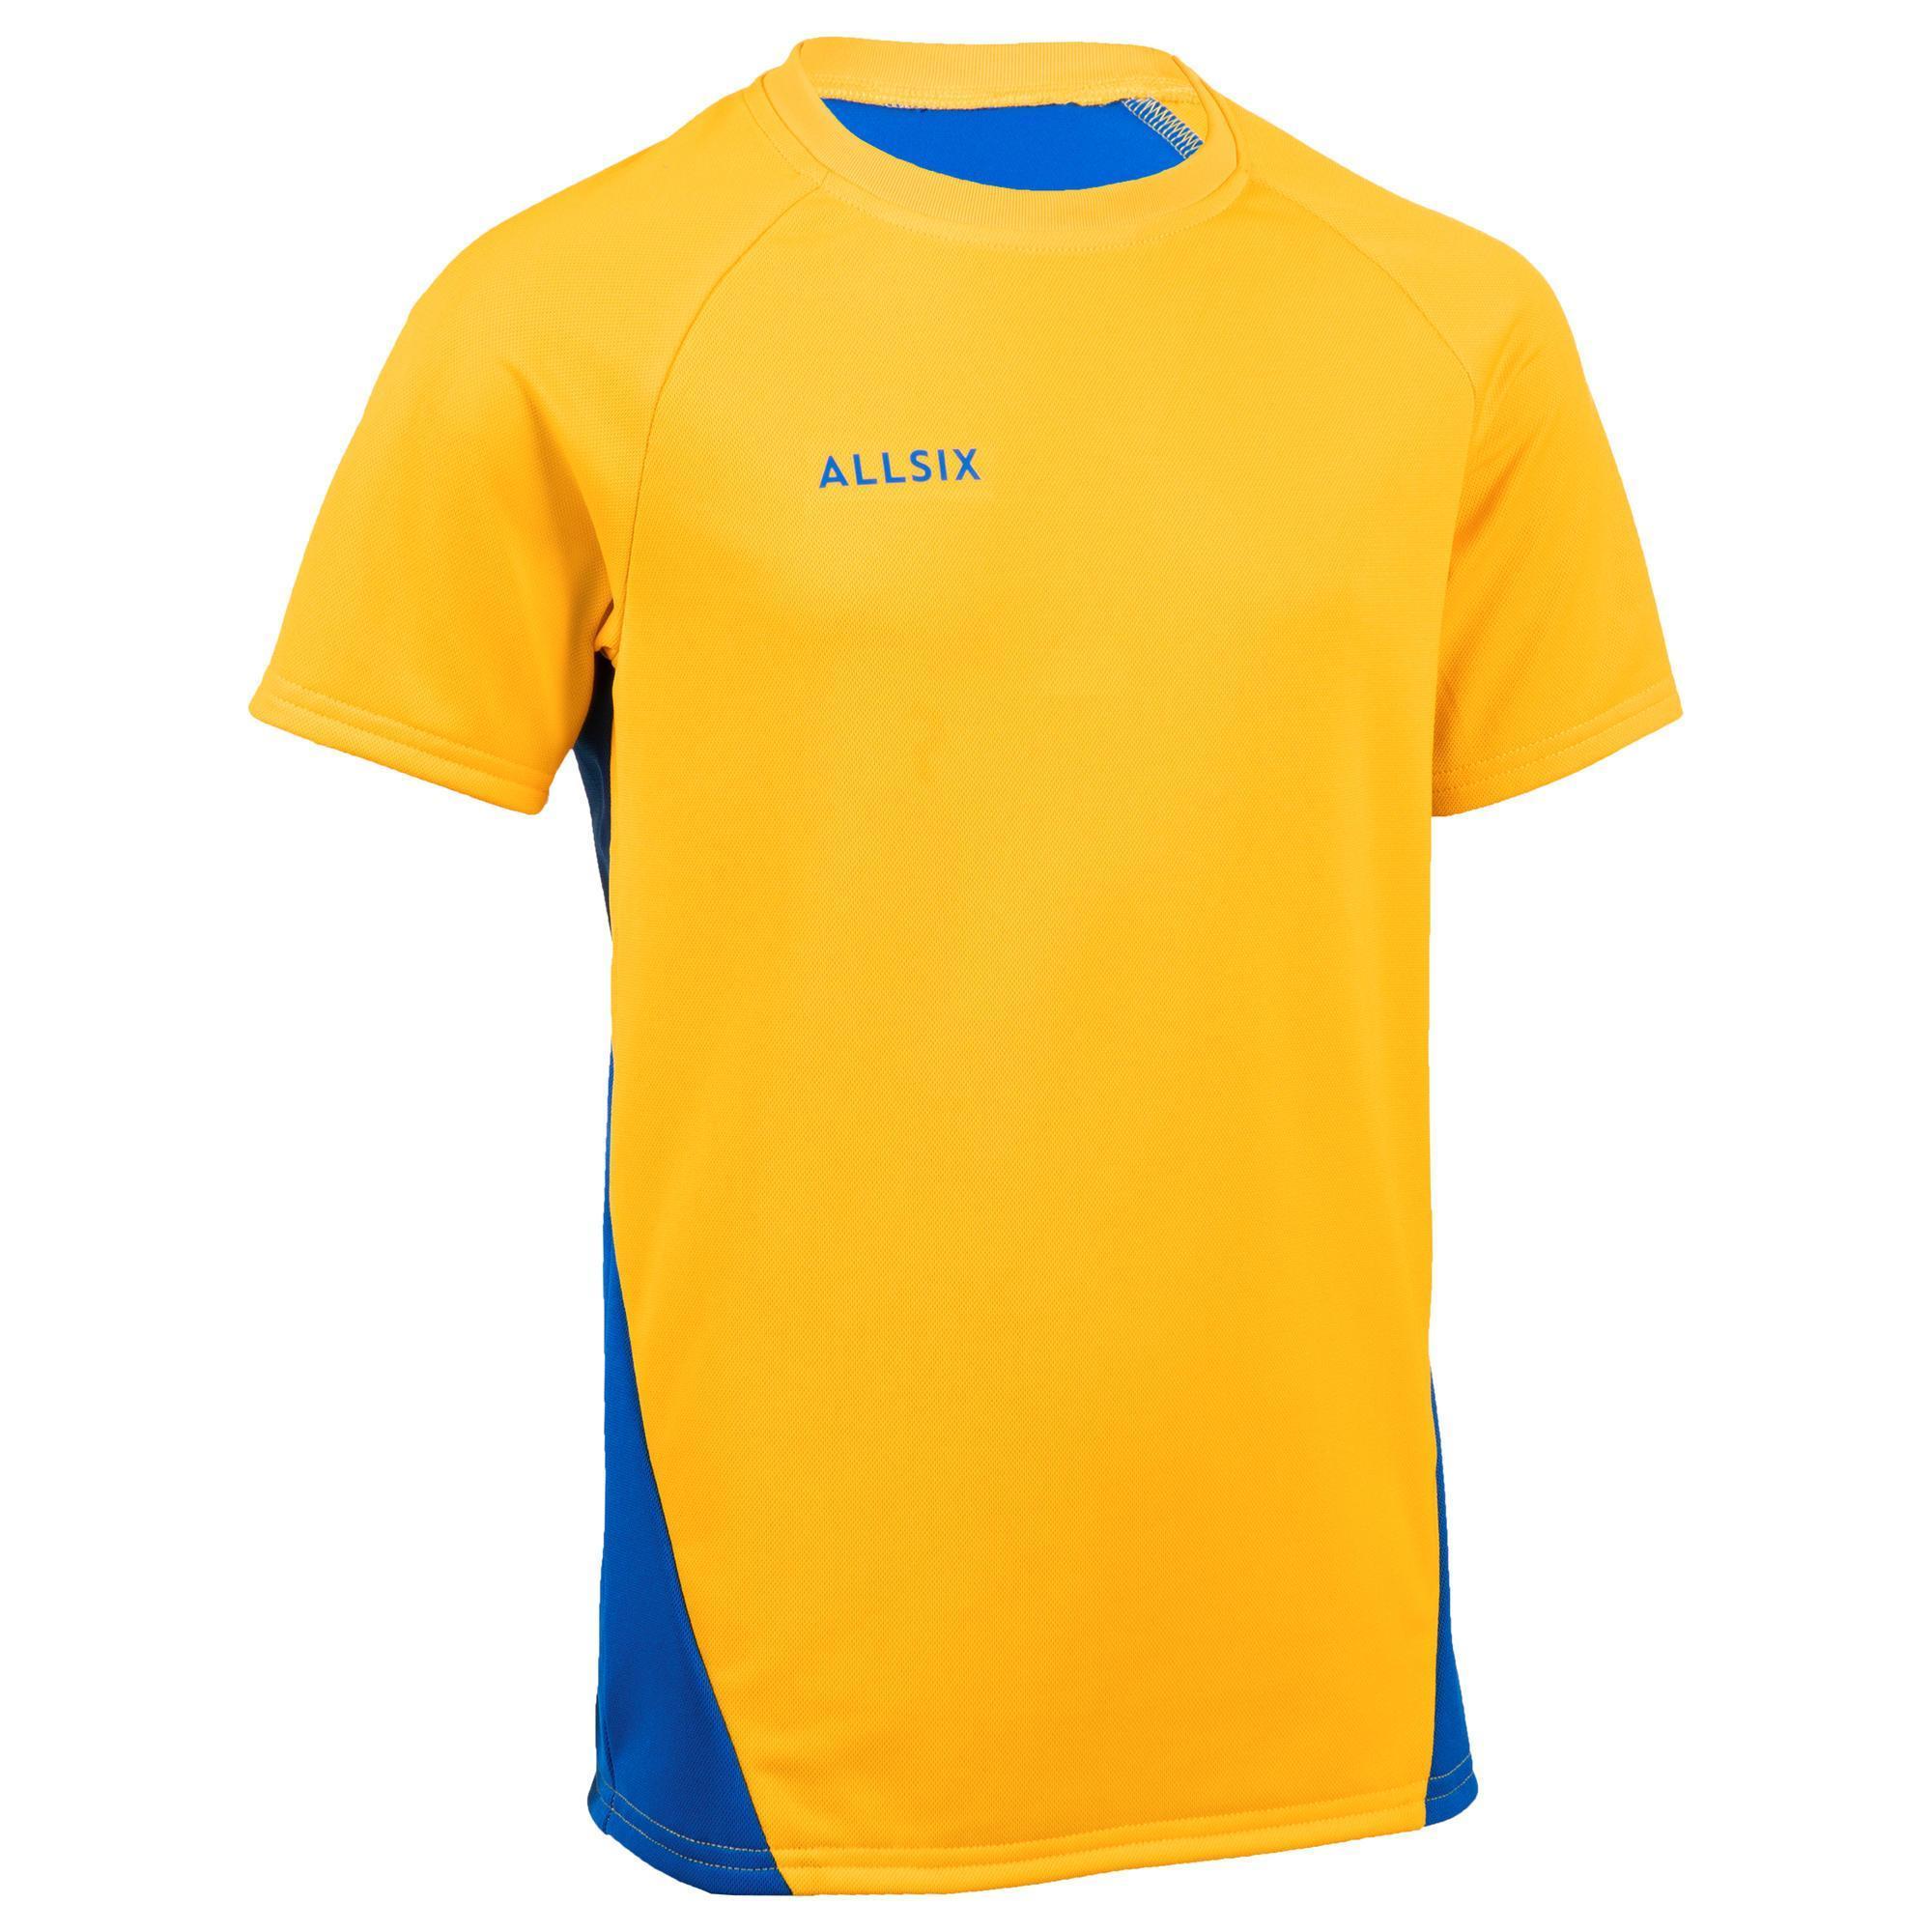 Allsix Volleybalshirt jongens V100 geel/blauw